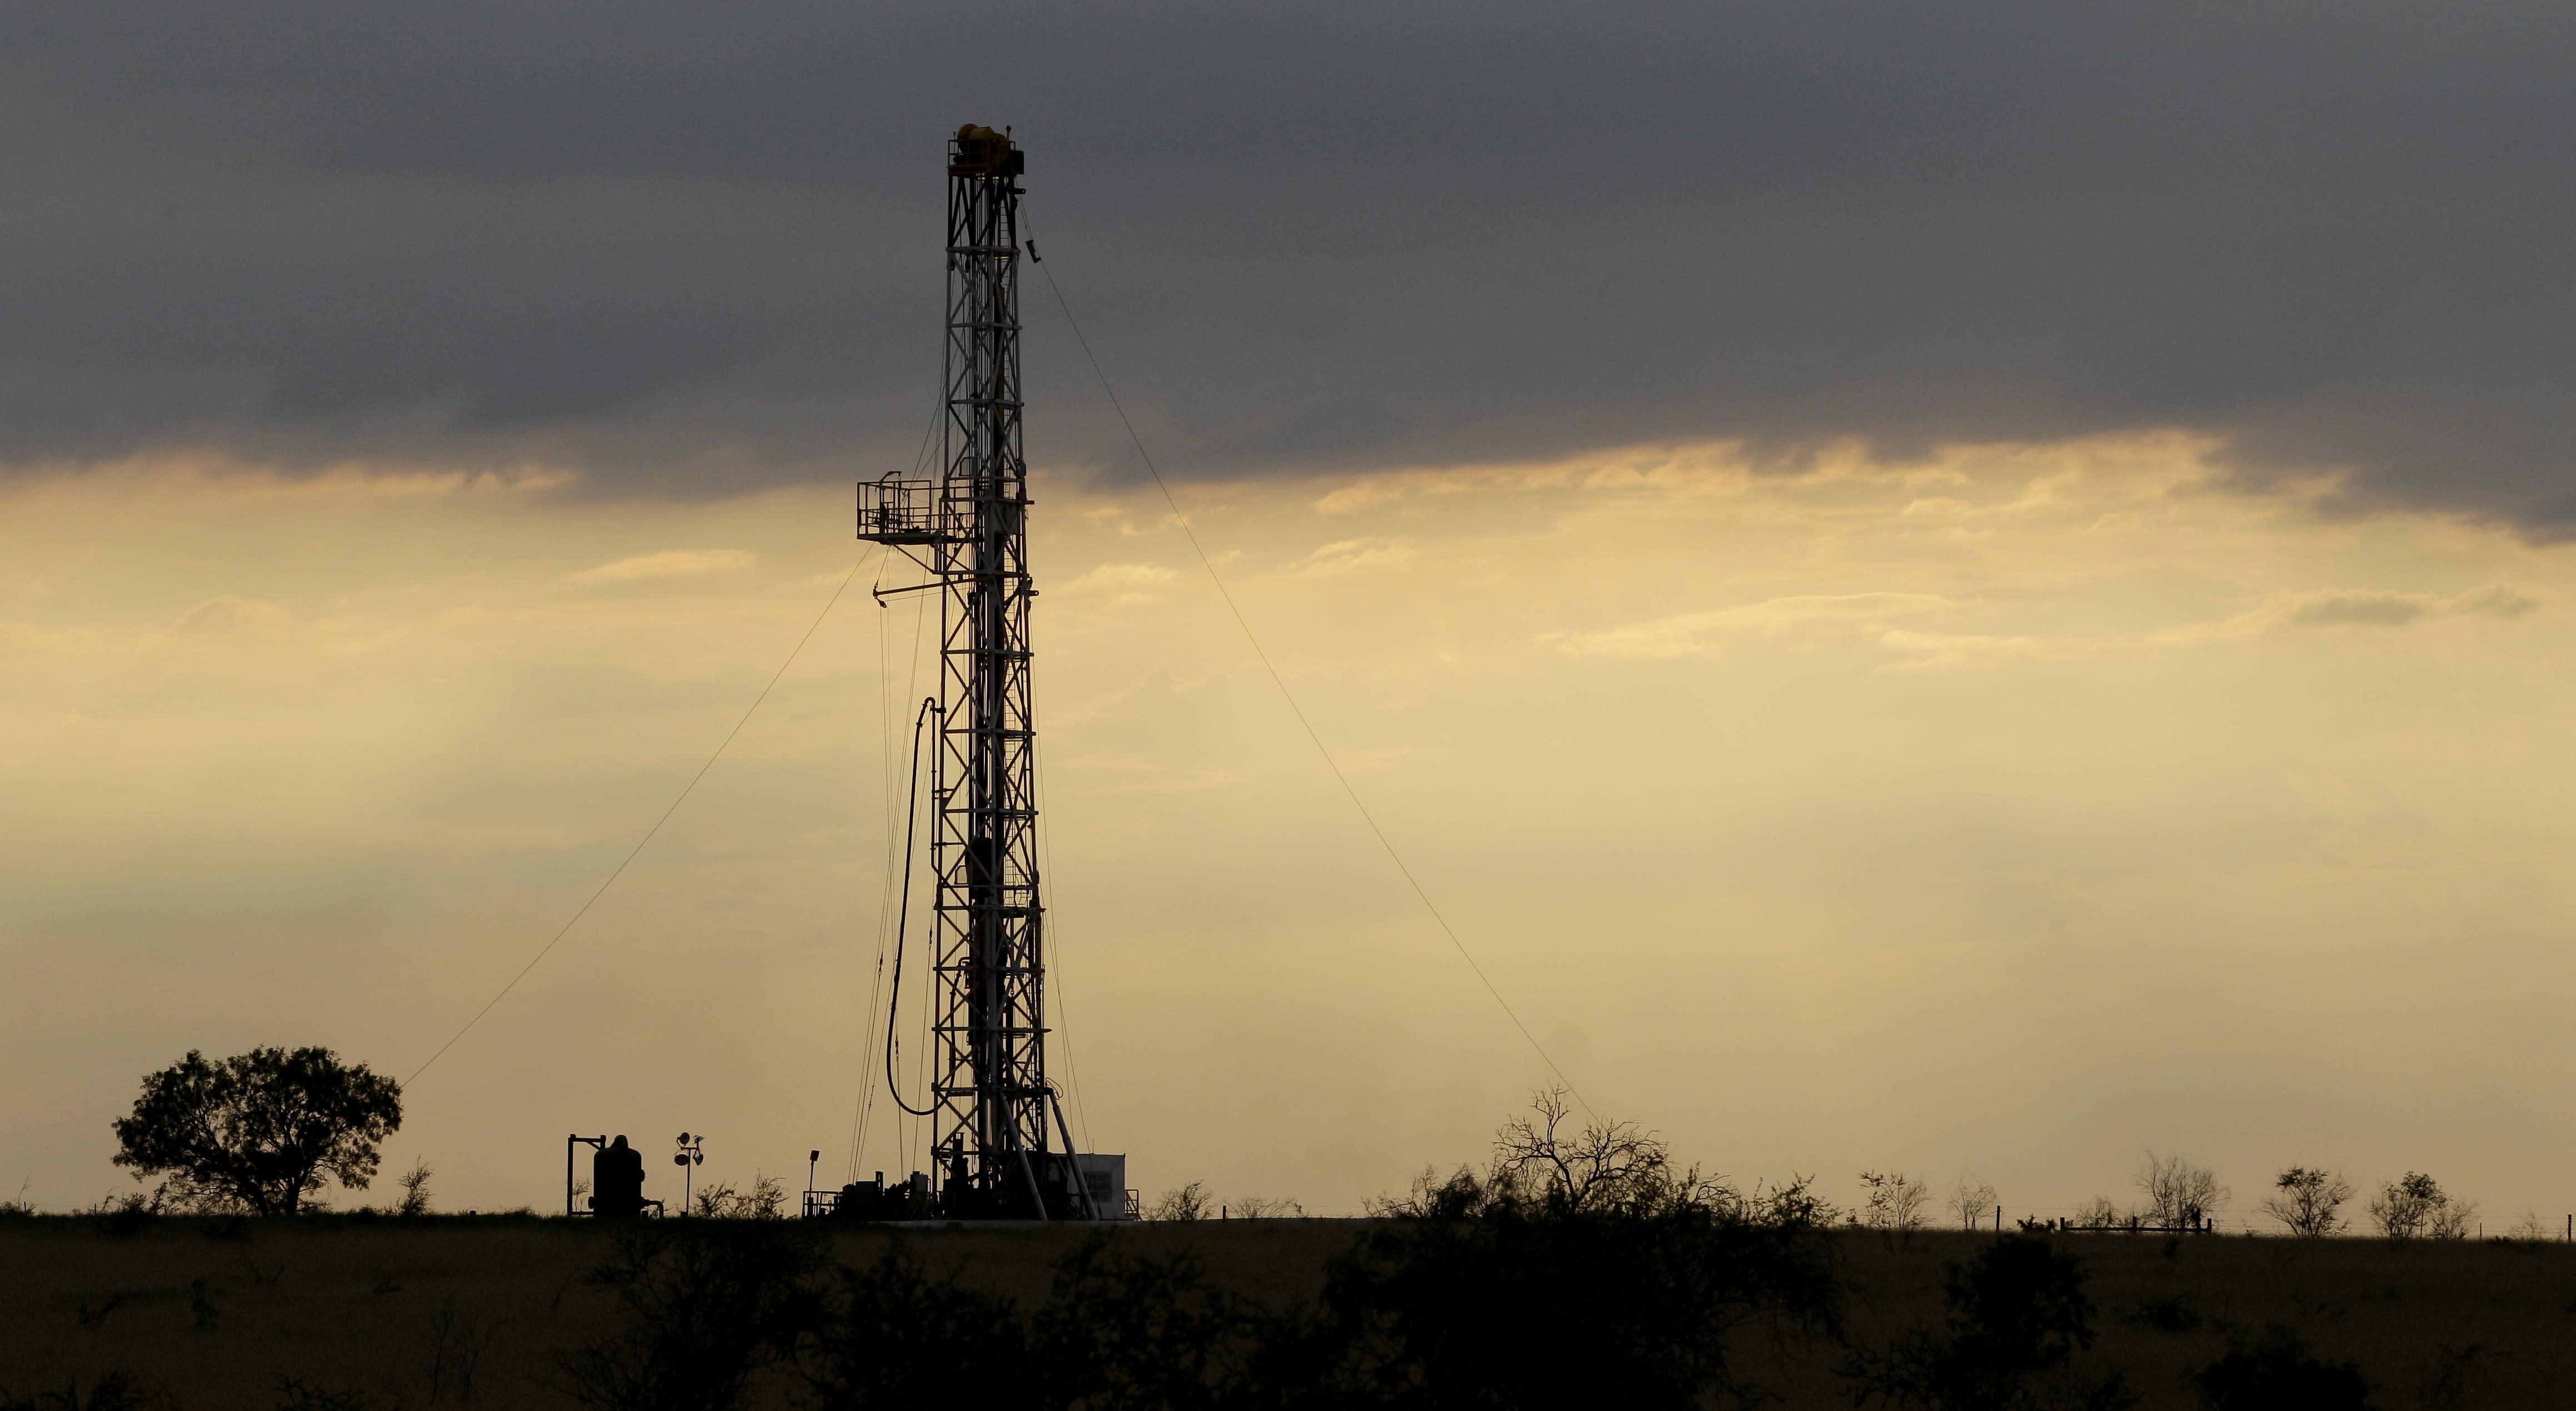 Crude supply 'dwarfed' by cuts in demand: oil watcher